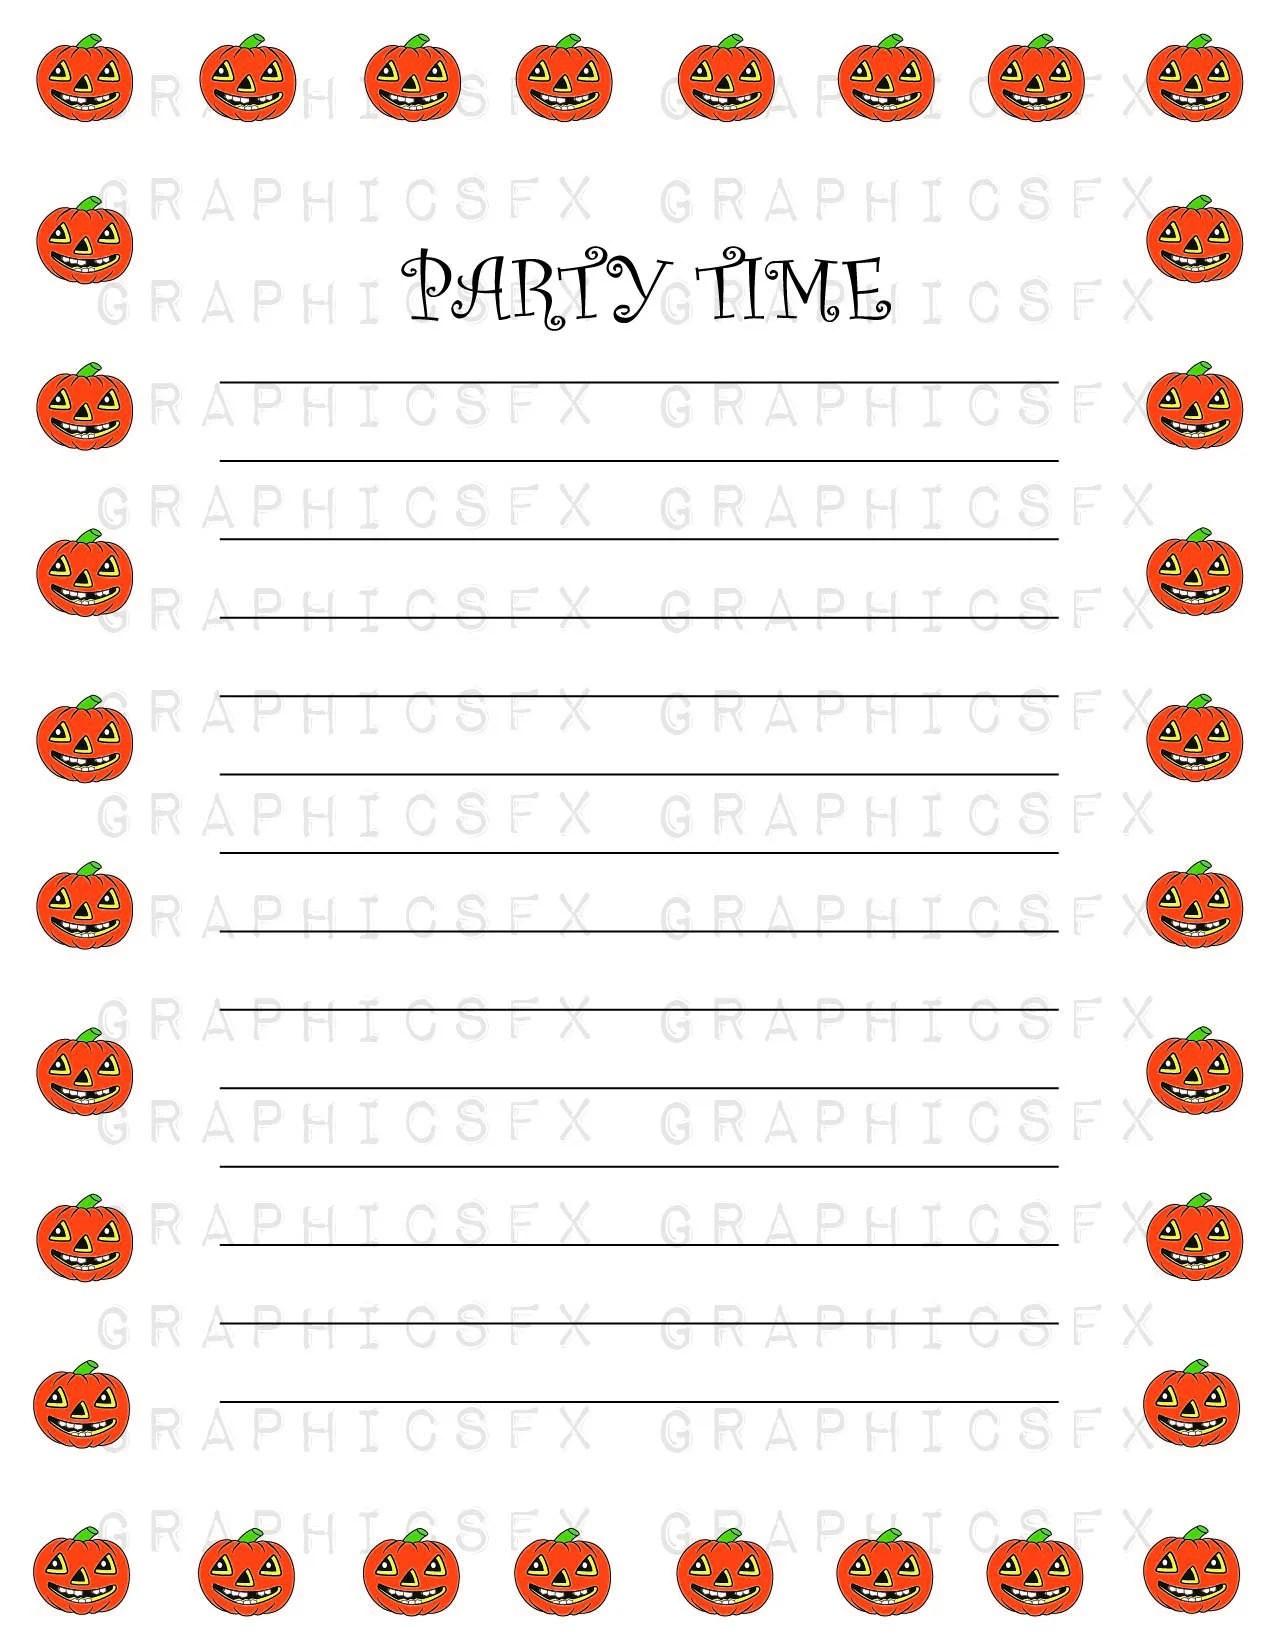 Halloween Party List Border With Jackolanterns Design 002 Use Etsy